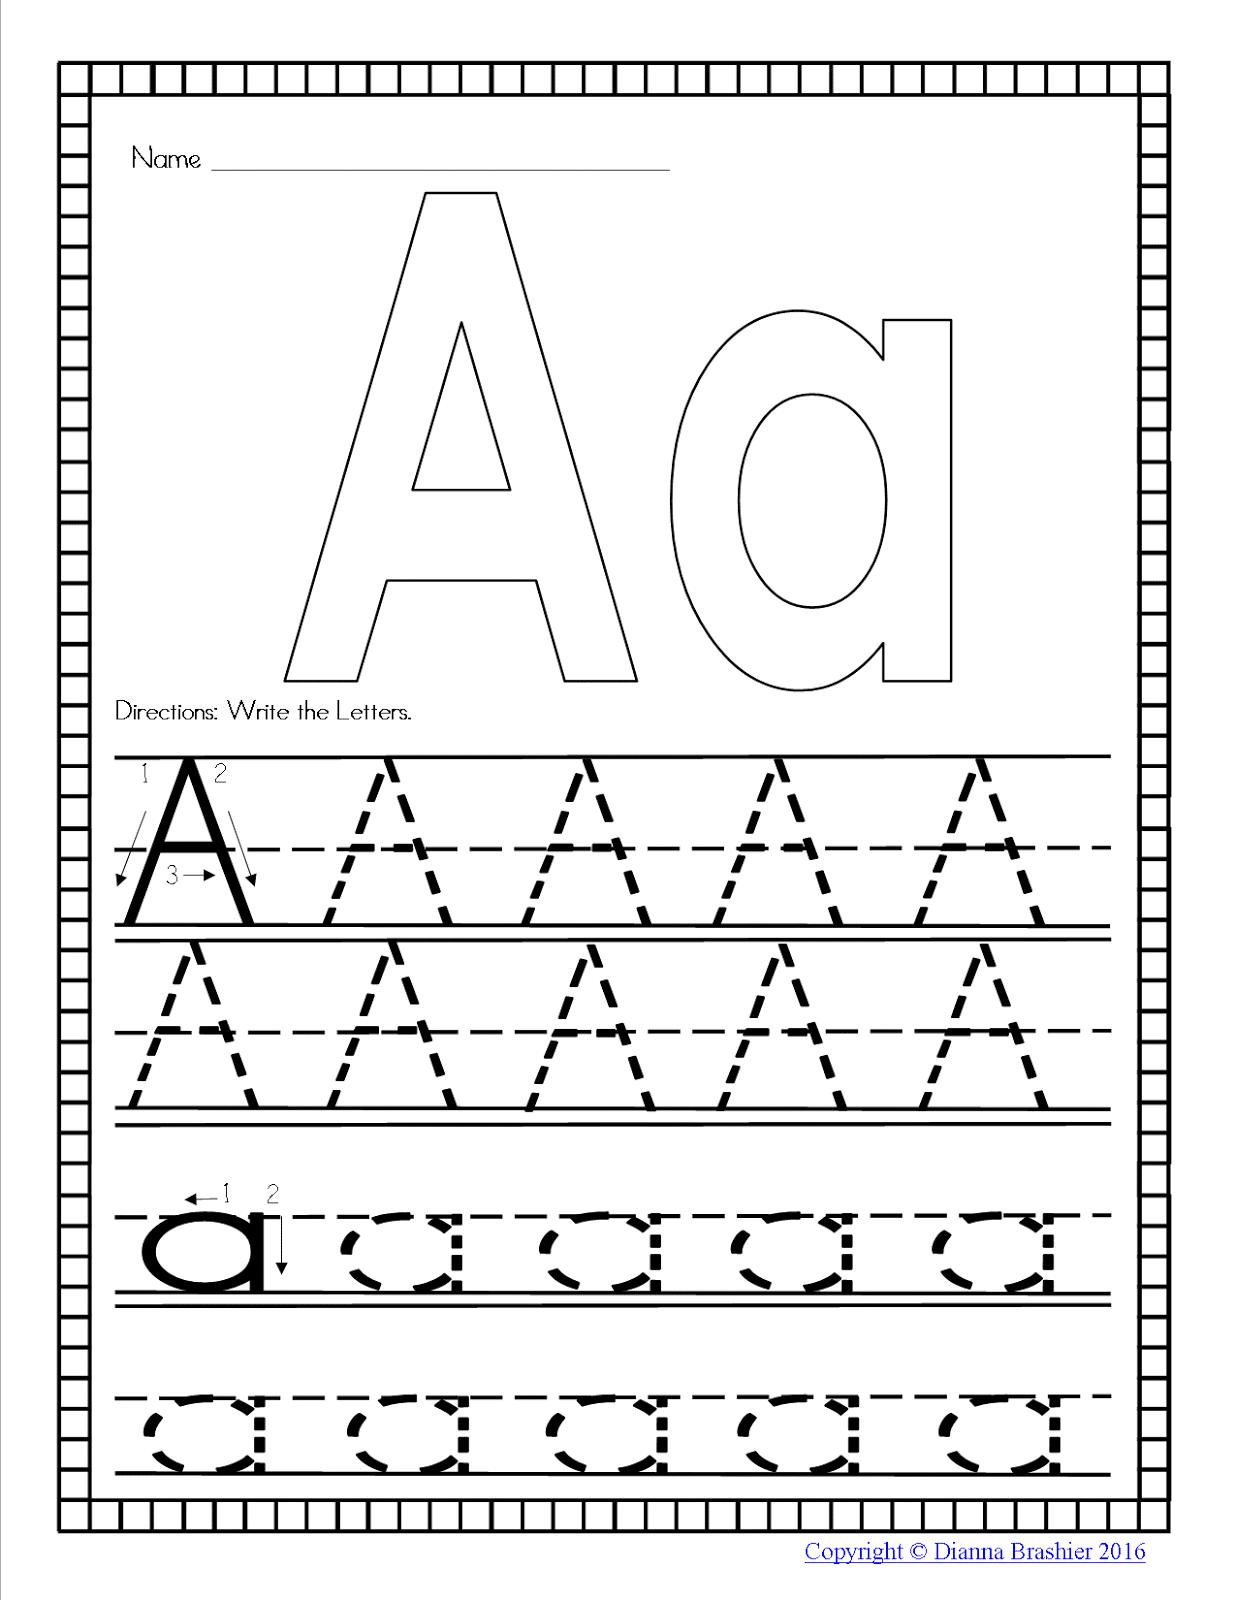 Teachers R Us Alphabet Handwriting Practice